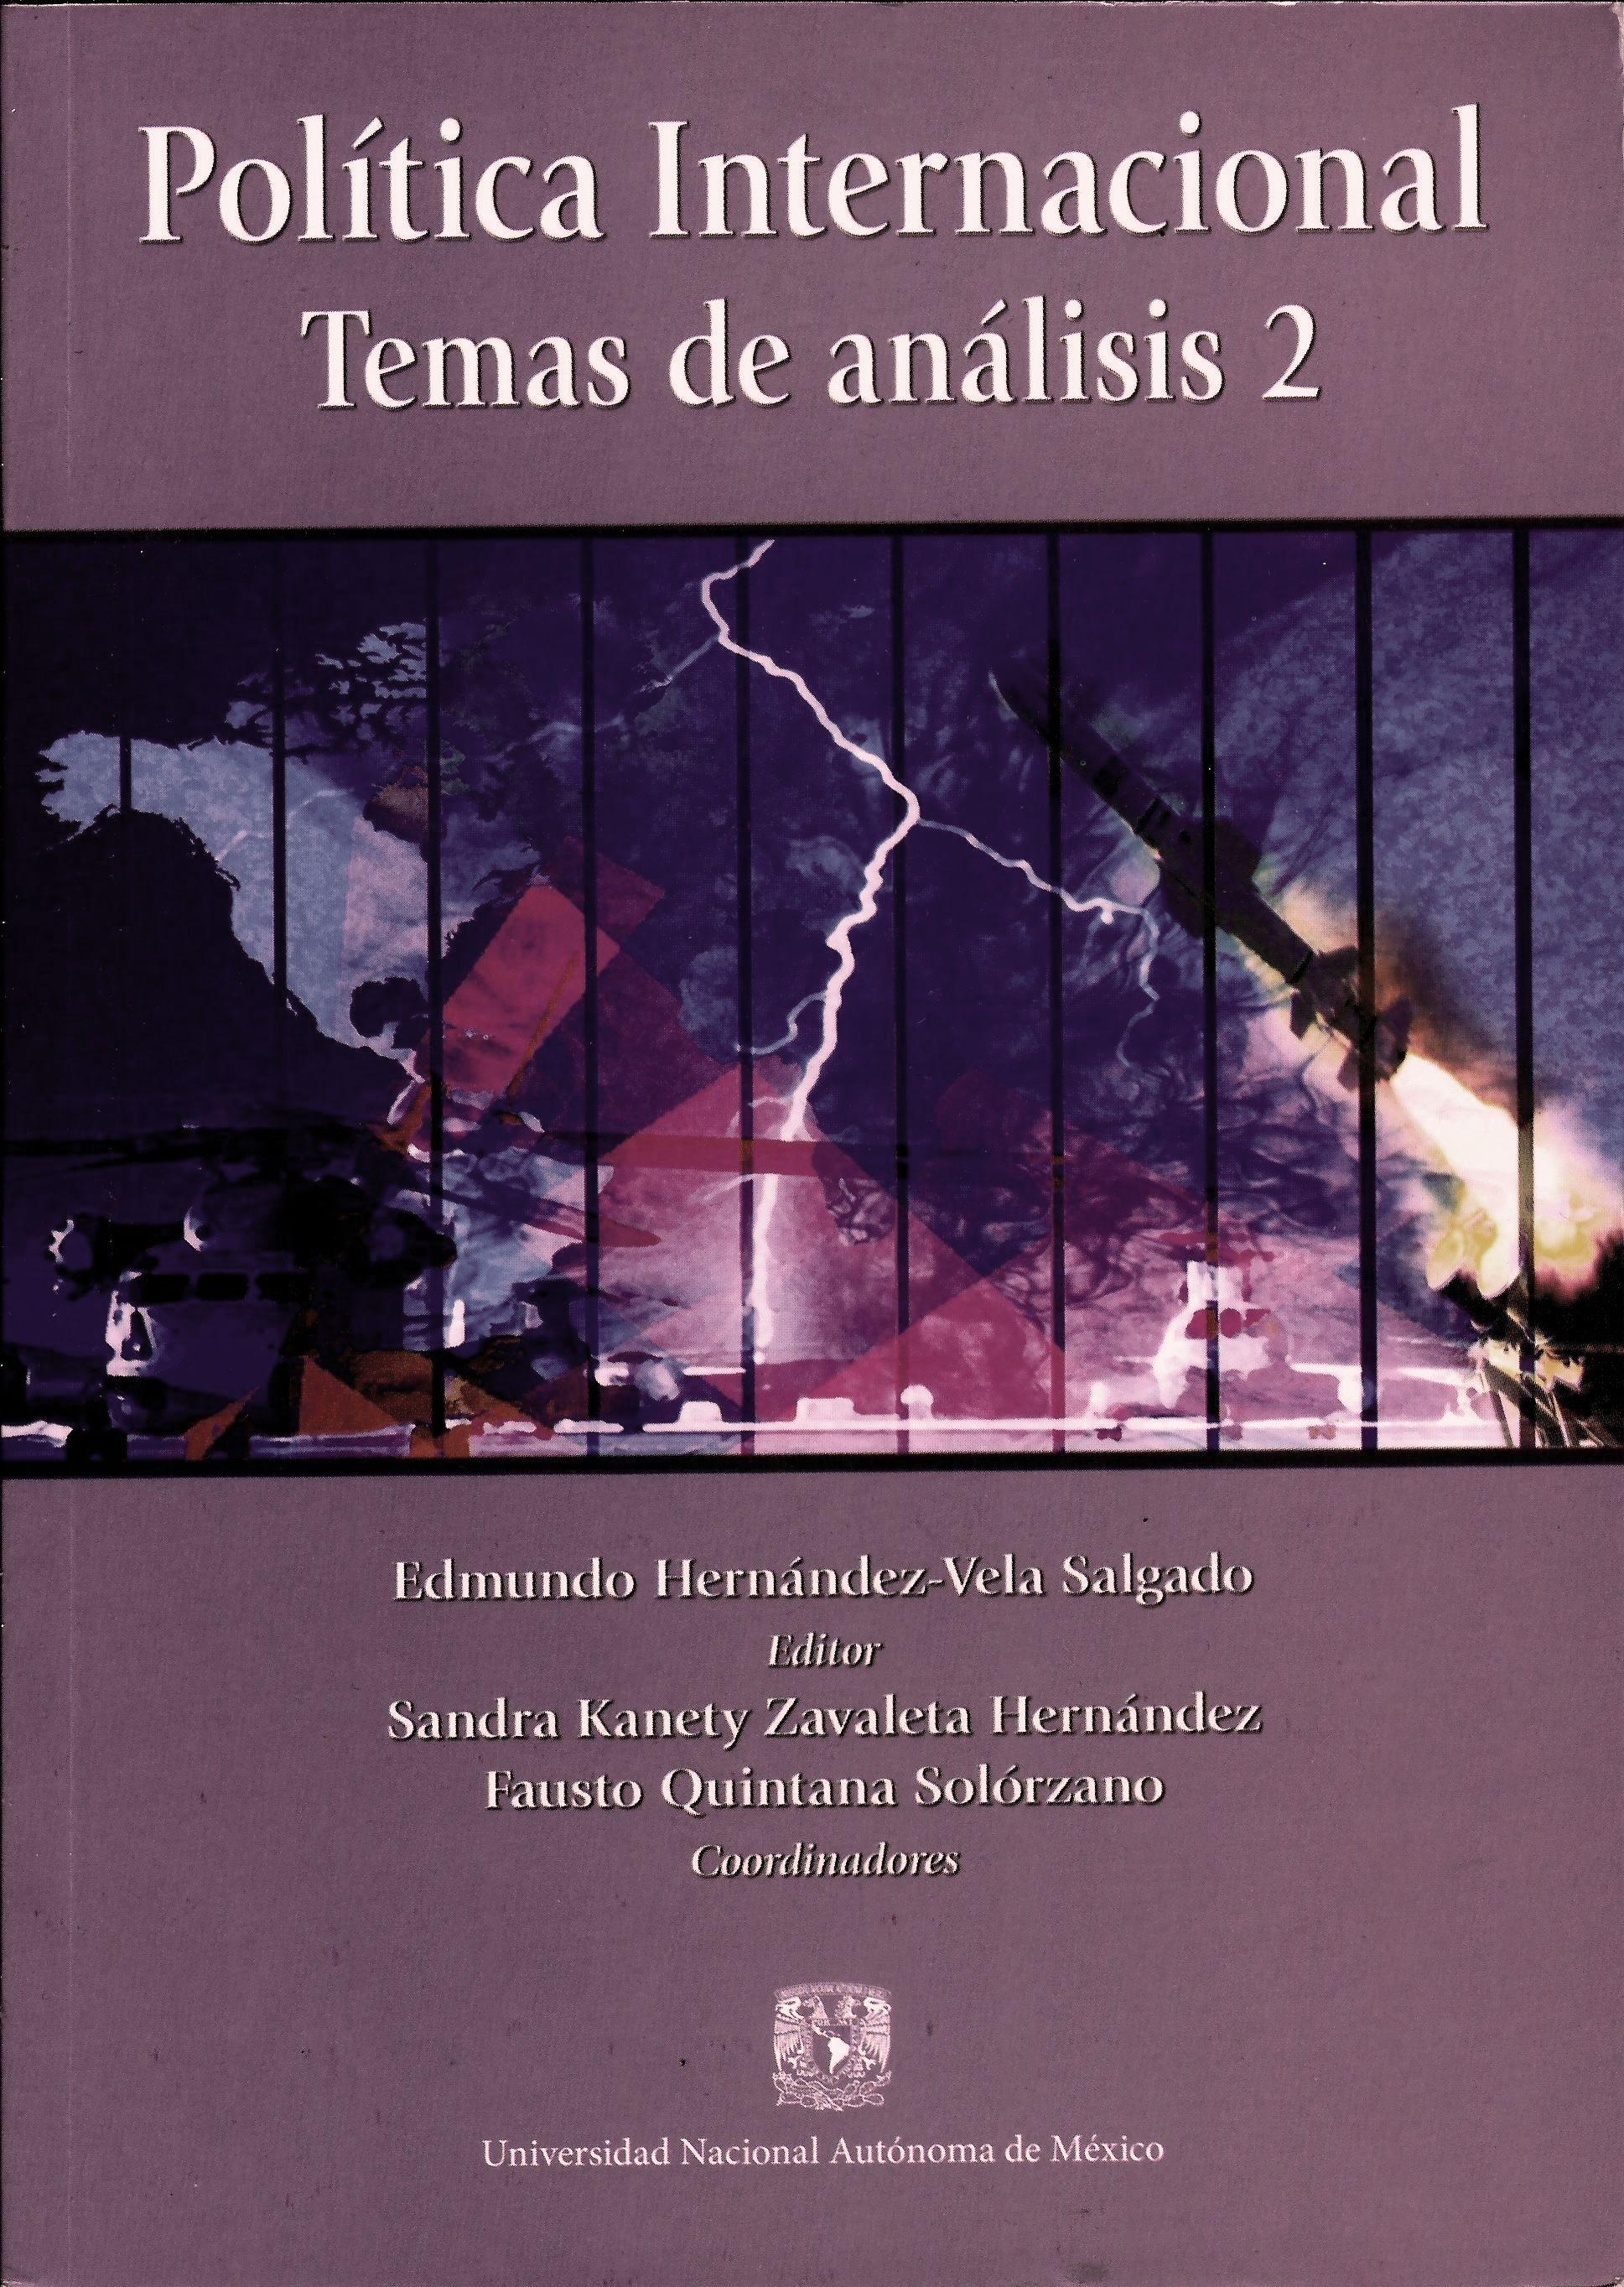 Política internacional. Temas de análisis 2